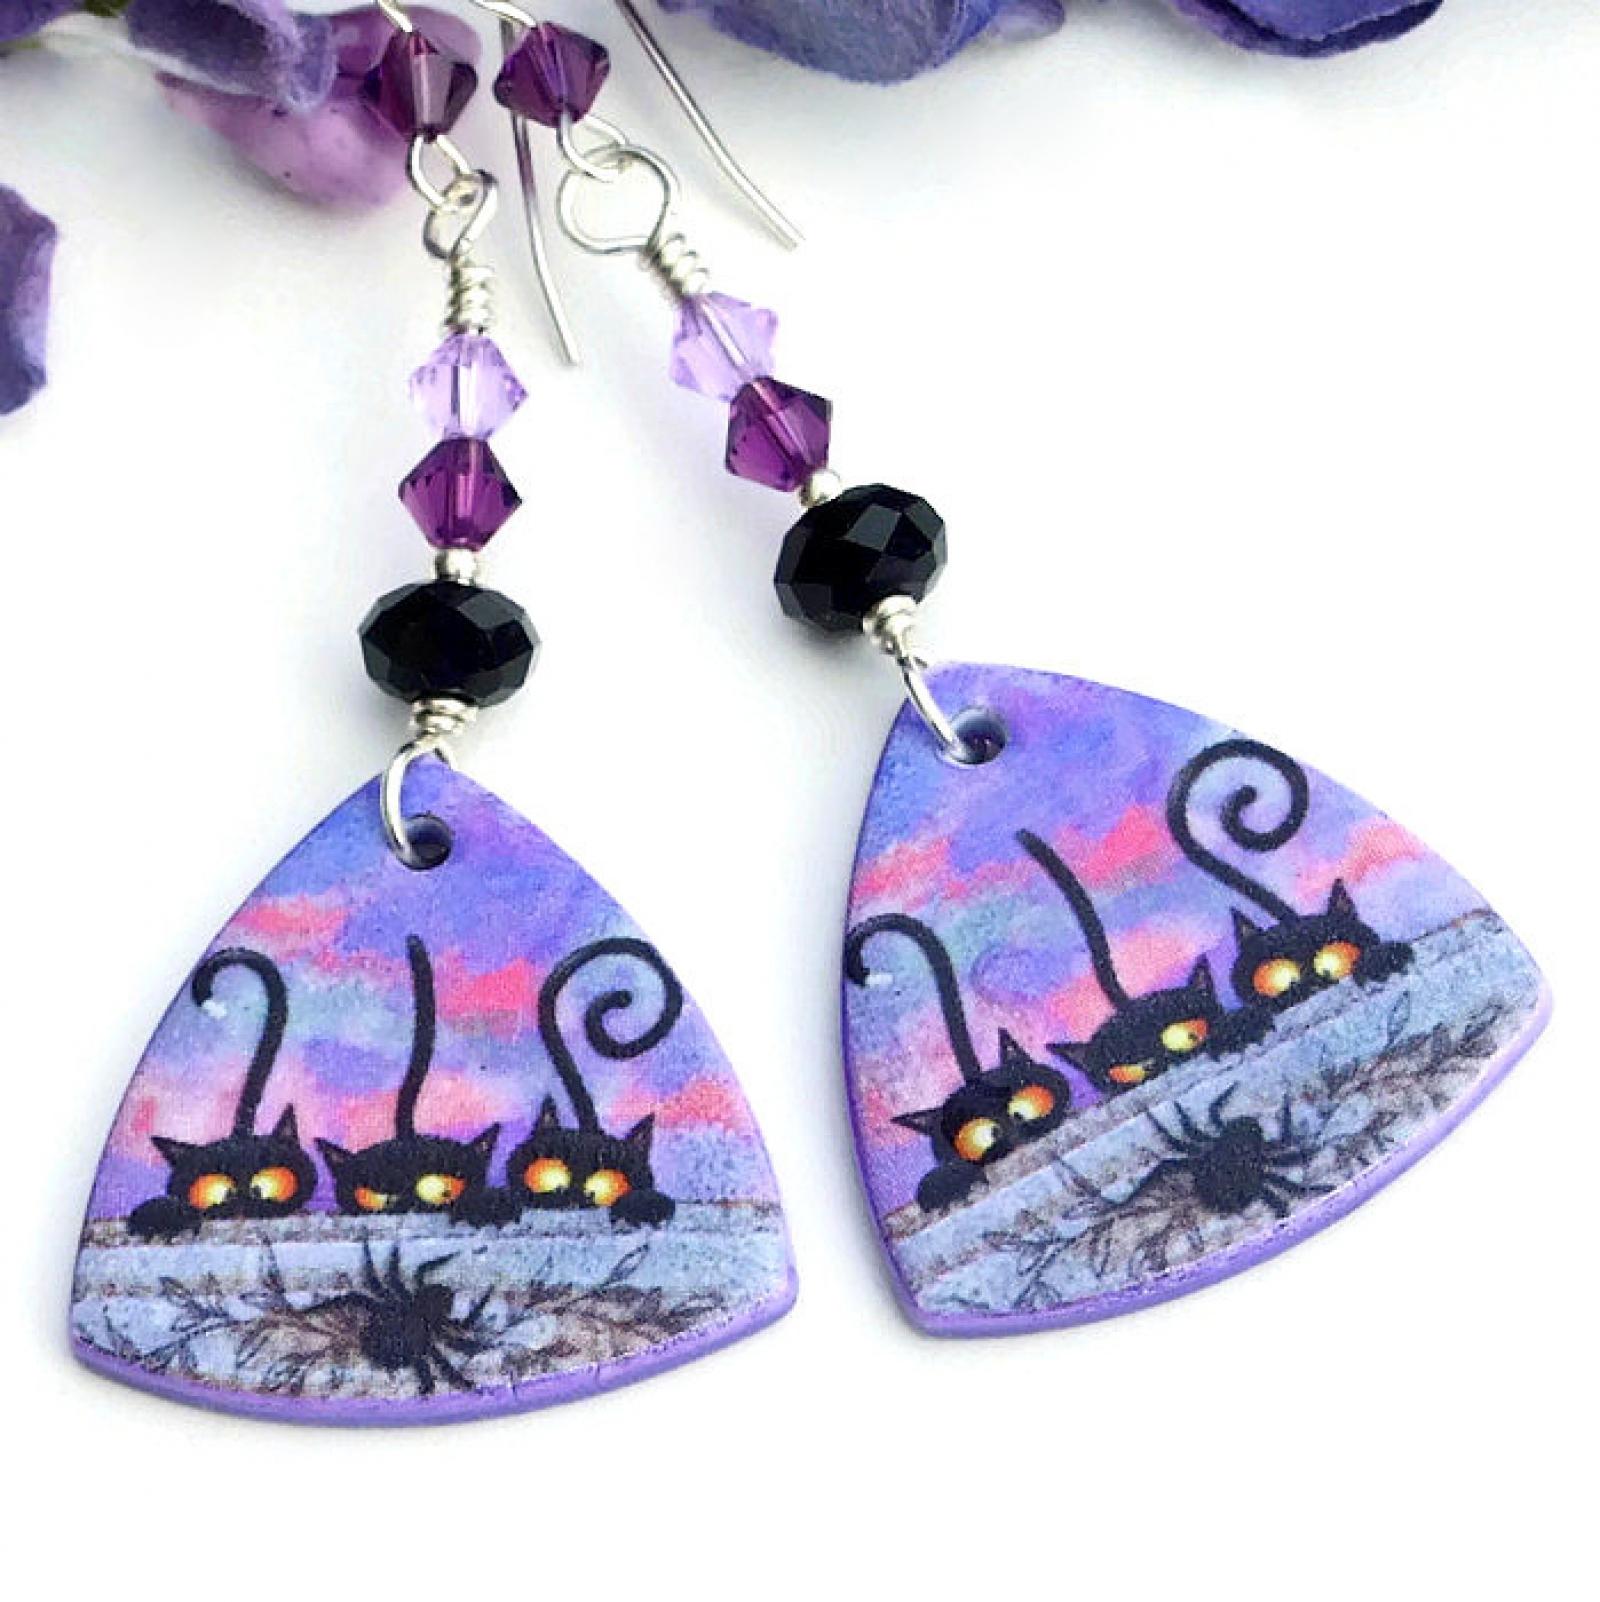 Black Cats Spider Halloween Earrings, Handmade Purple Black Jewelry